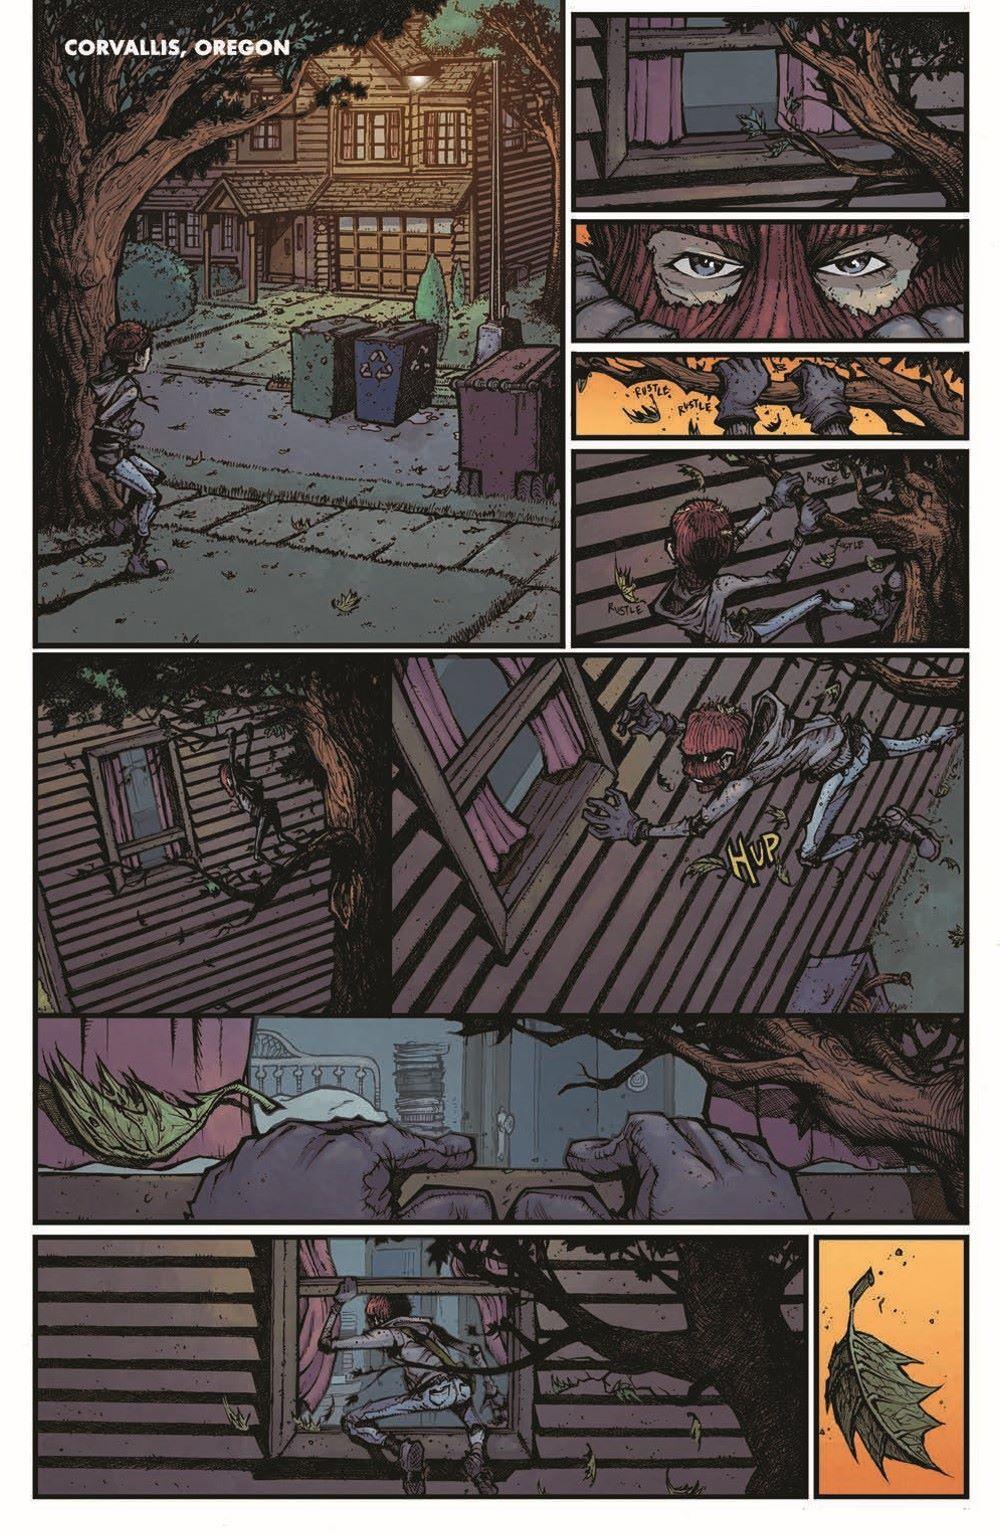 MTNH-TPB_pr-6 ComicList Previews: MOUNTAINHEAD VOLUME 1 TP